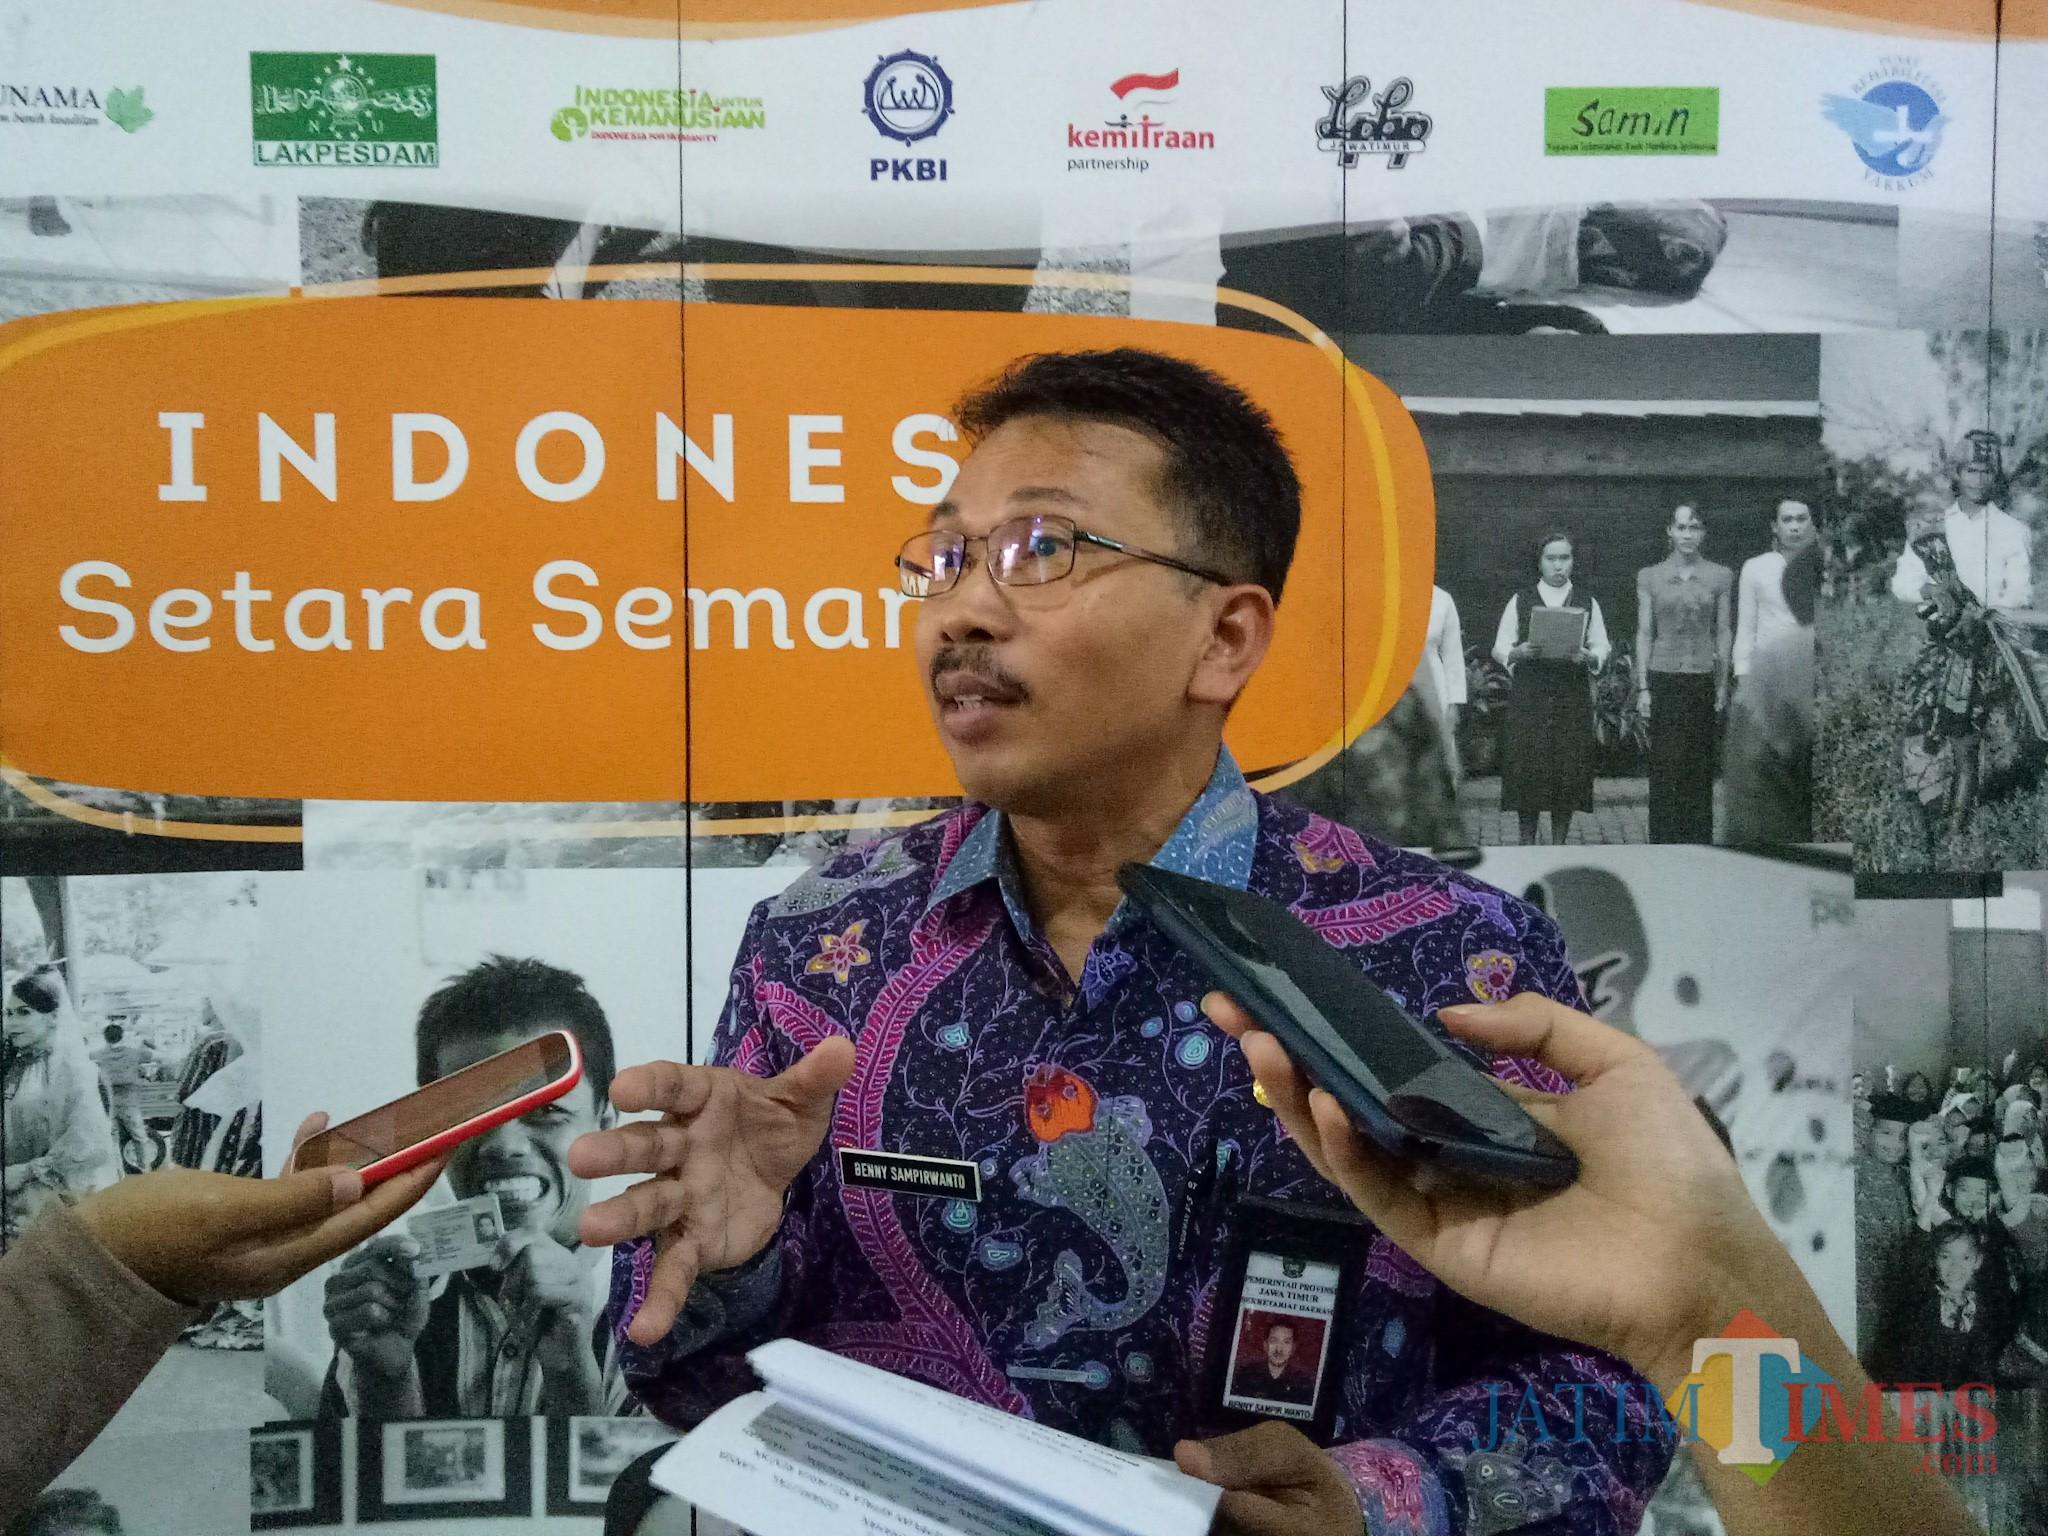 Kepala Bakorwil III Jatim diMalang, Benny Sampirwanto. (Foto: Imarotul Izzah/MalangTIMES)